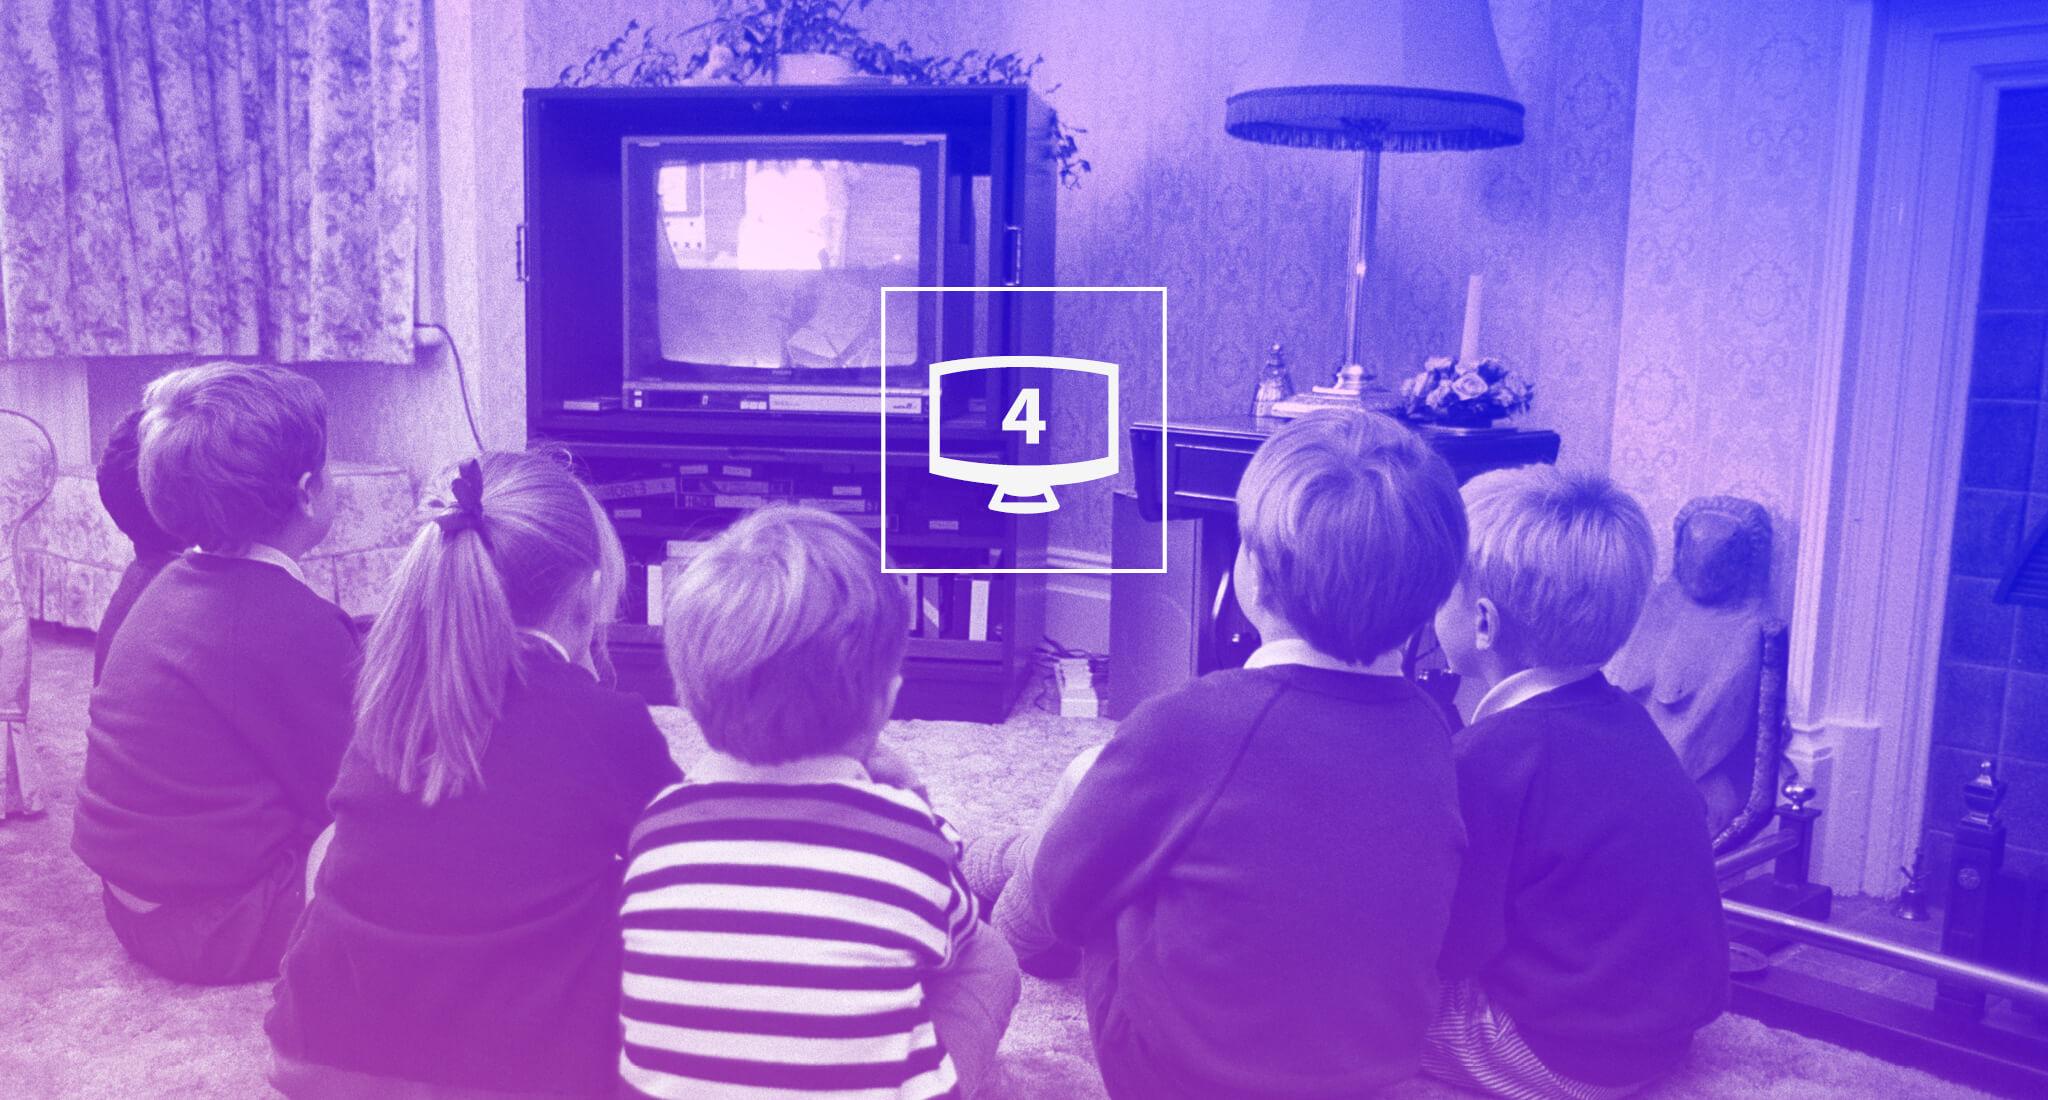 StarLight Digital начинает дистрибуцию четырех HD-телеканалов группы Vianet